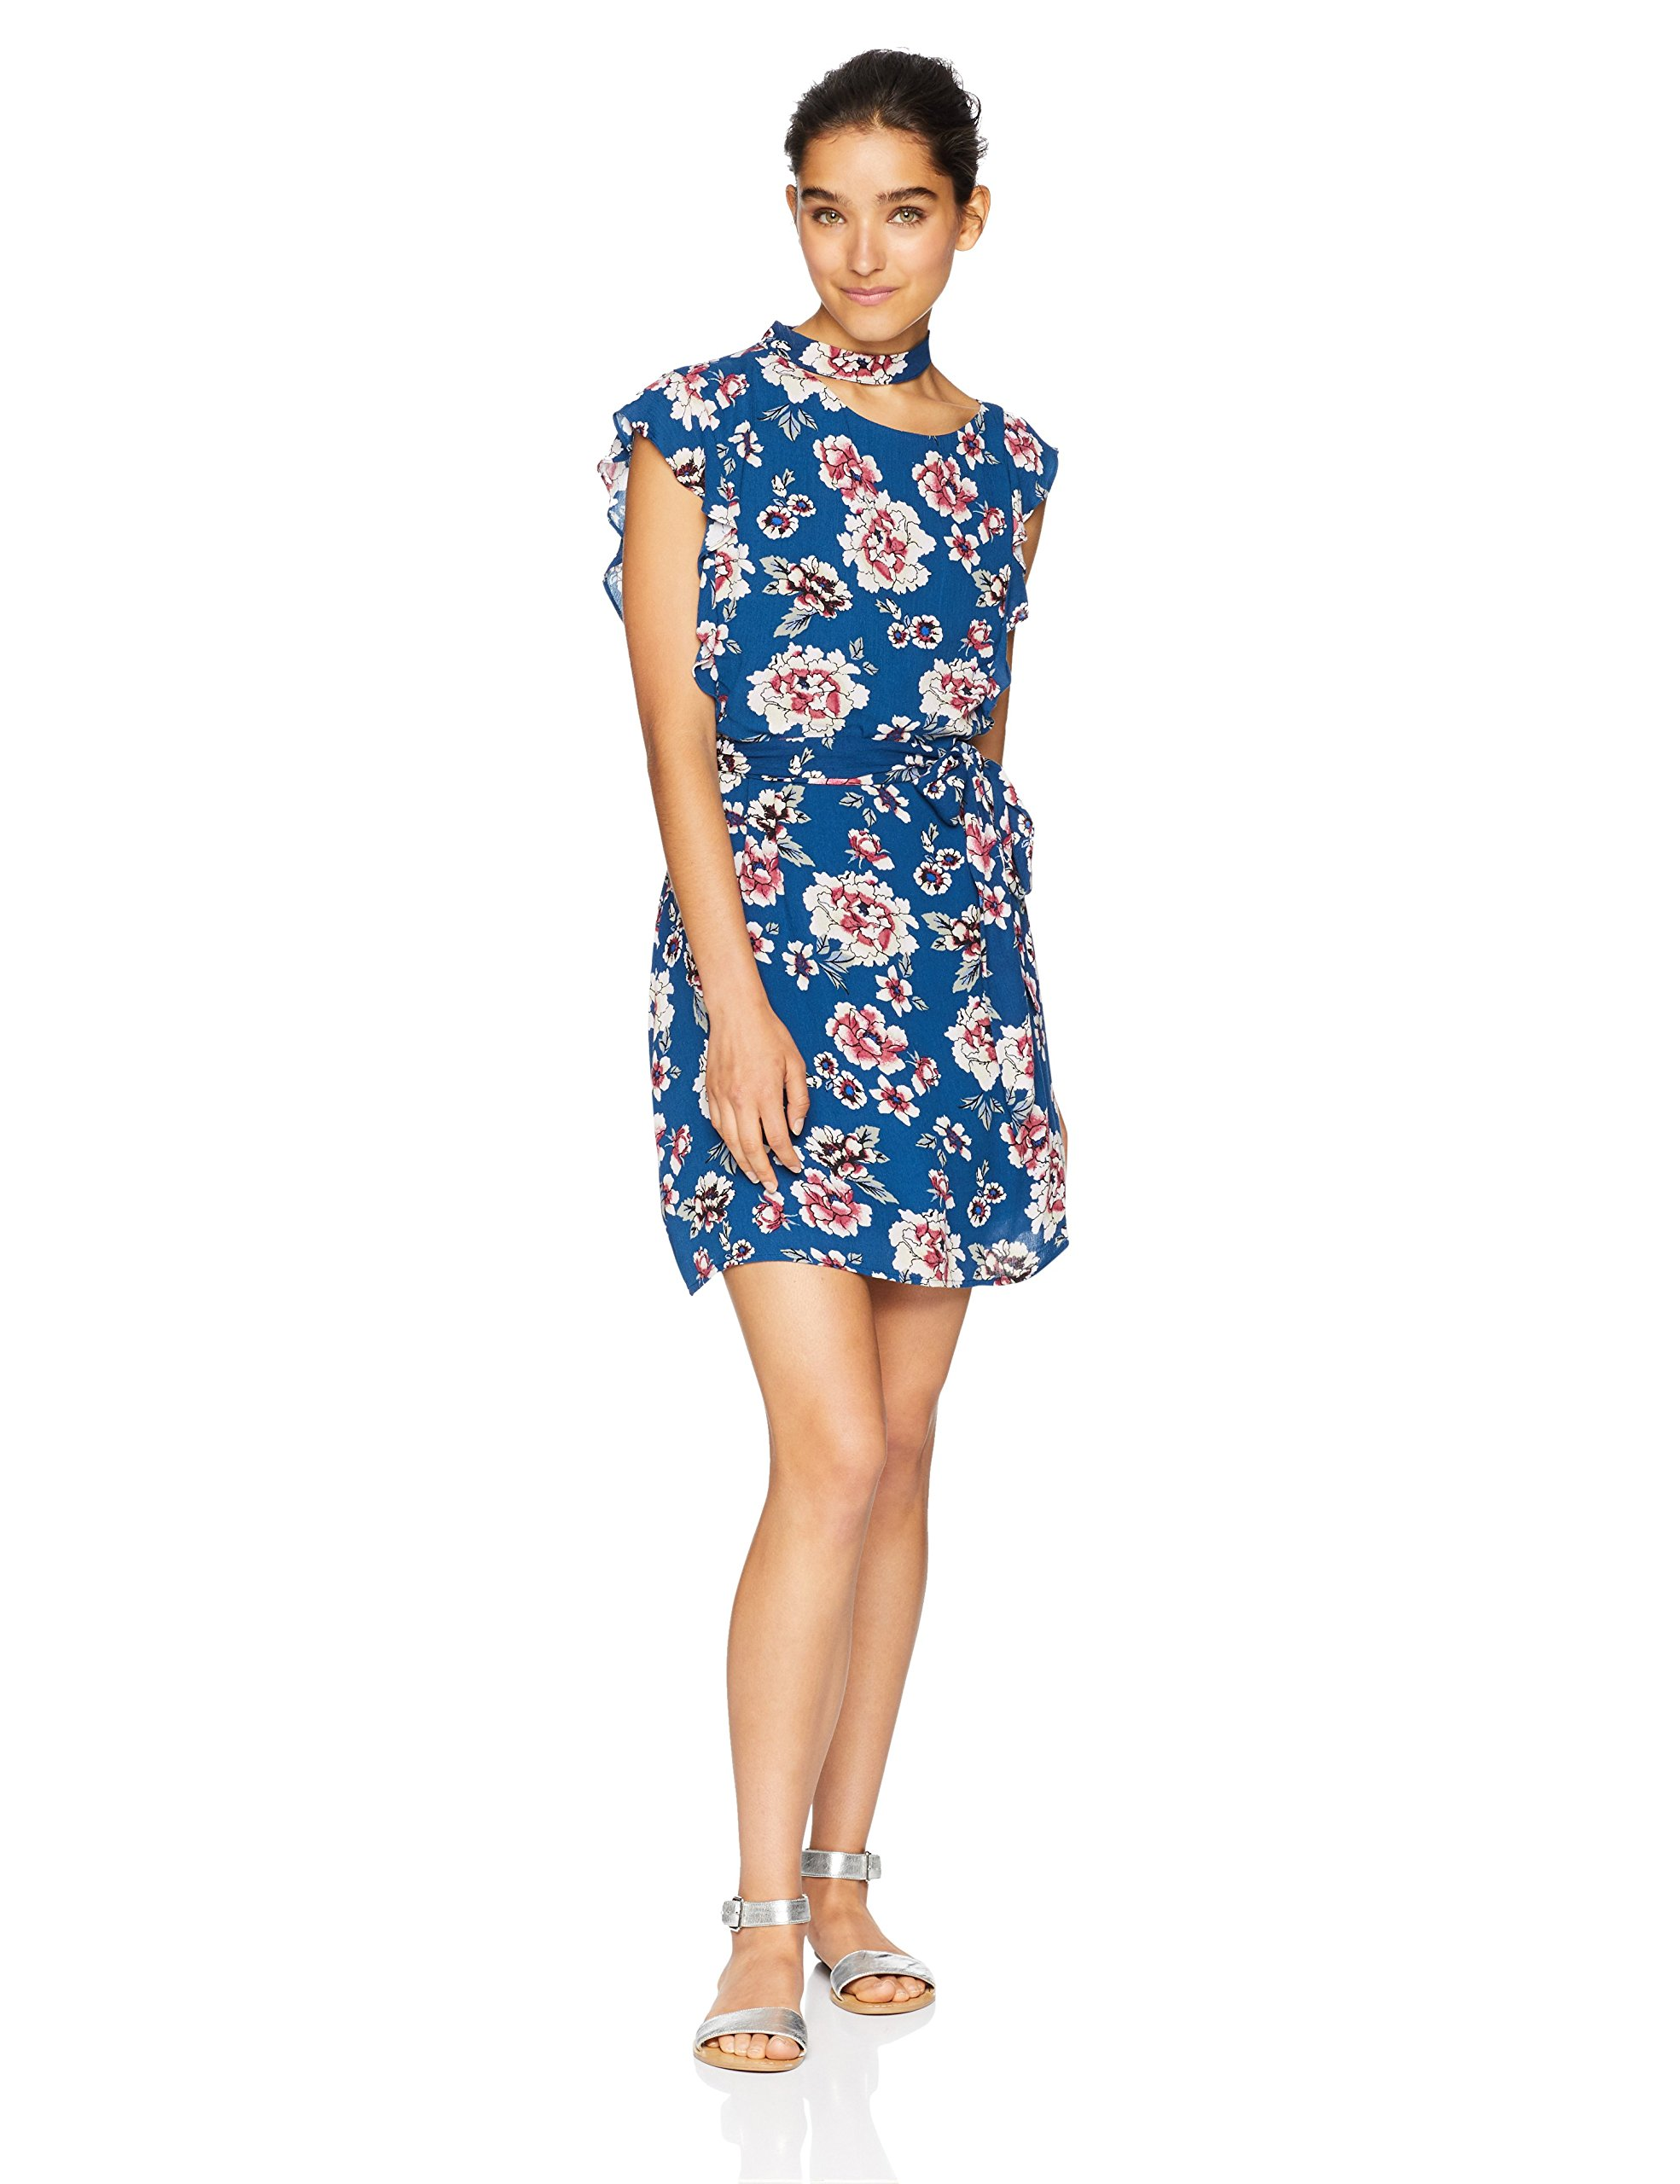 Available at Amazon: Jack Women's Kiss It Better Indigo Botanical Printed Dress